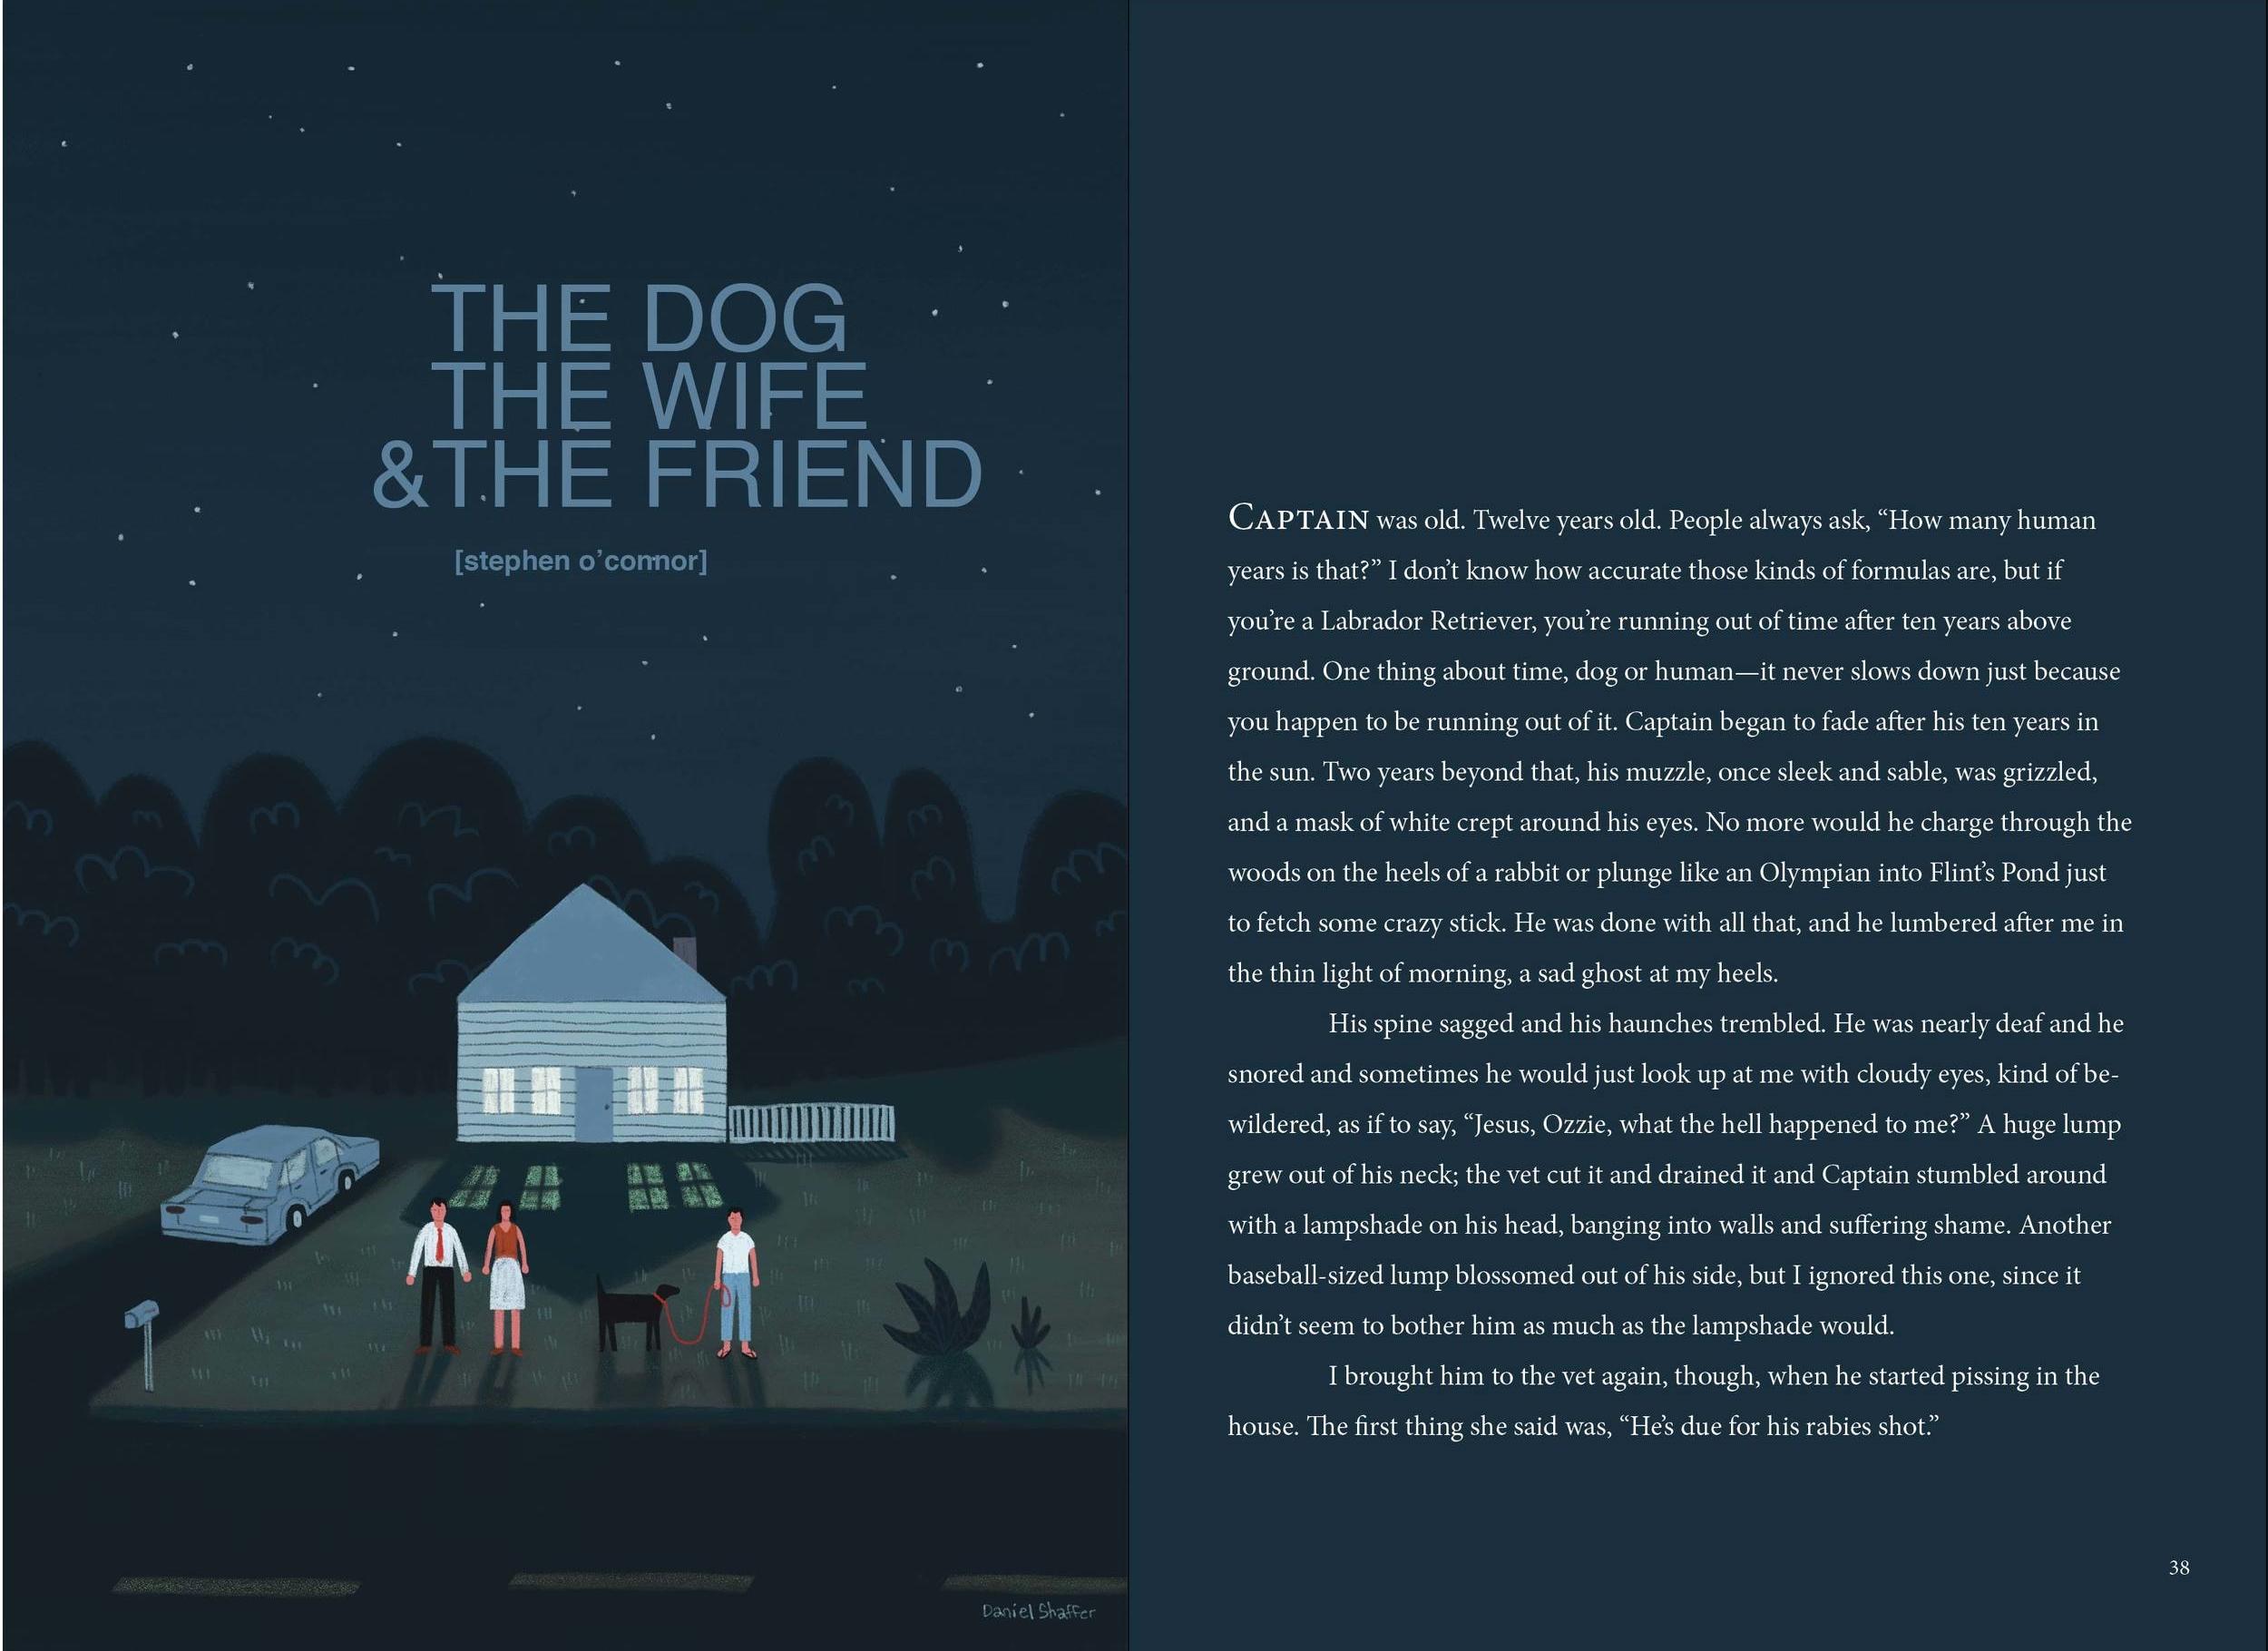 DogWifeFriend.jpg